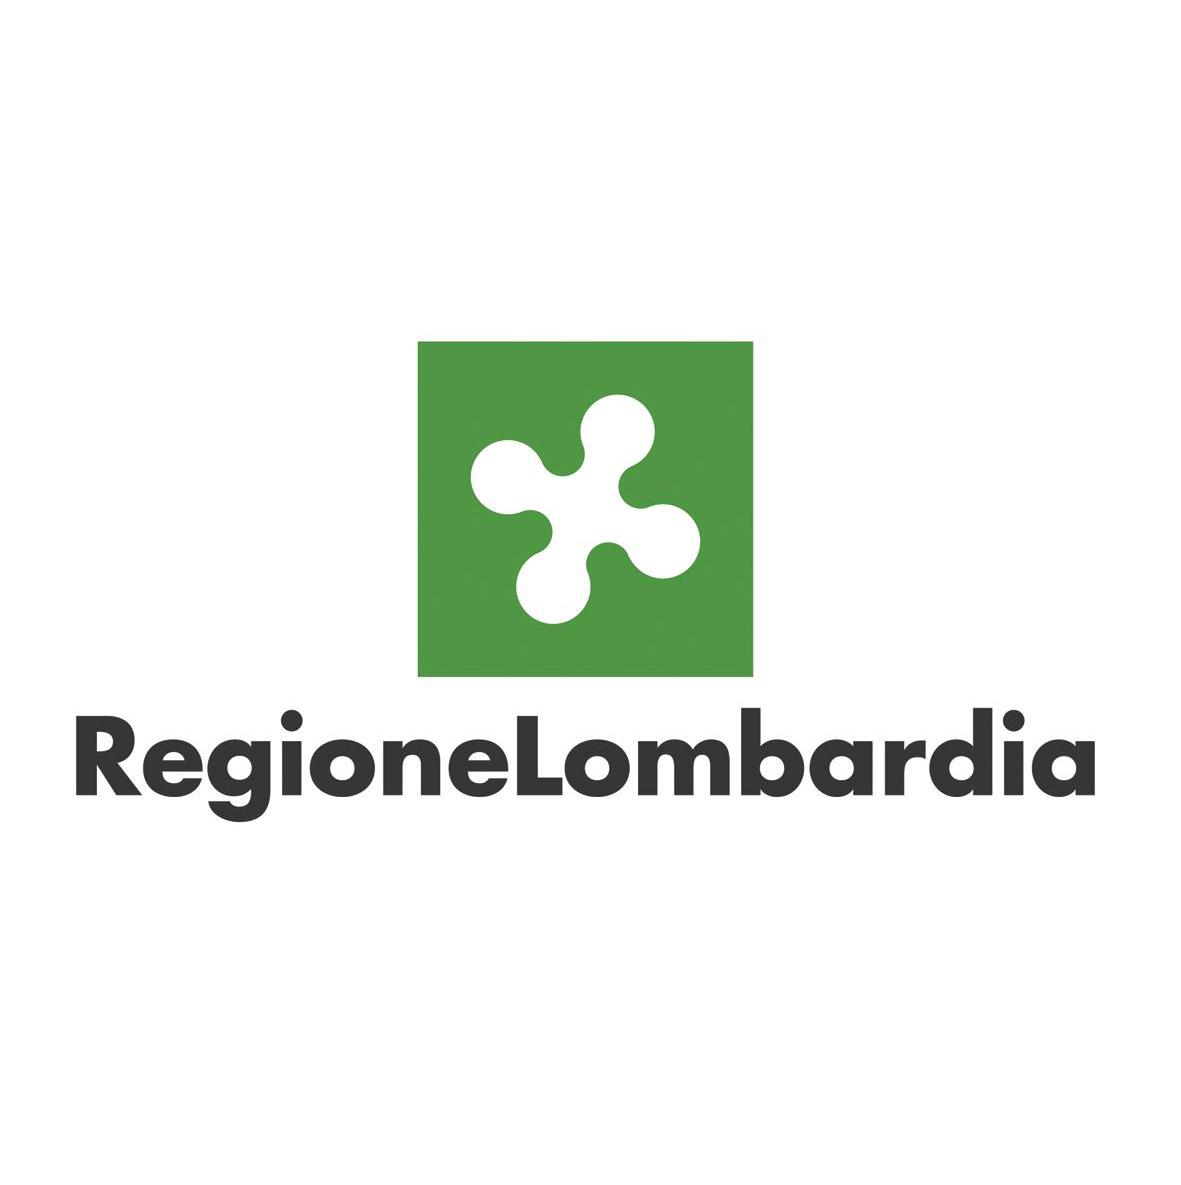 Lobgo regione lombardia